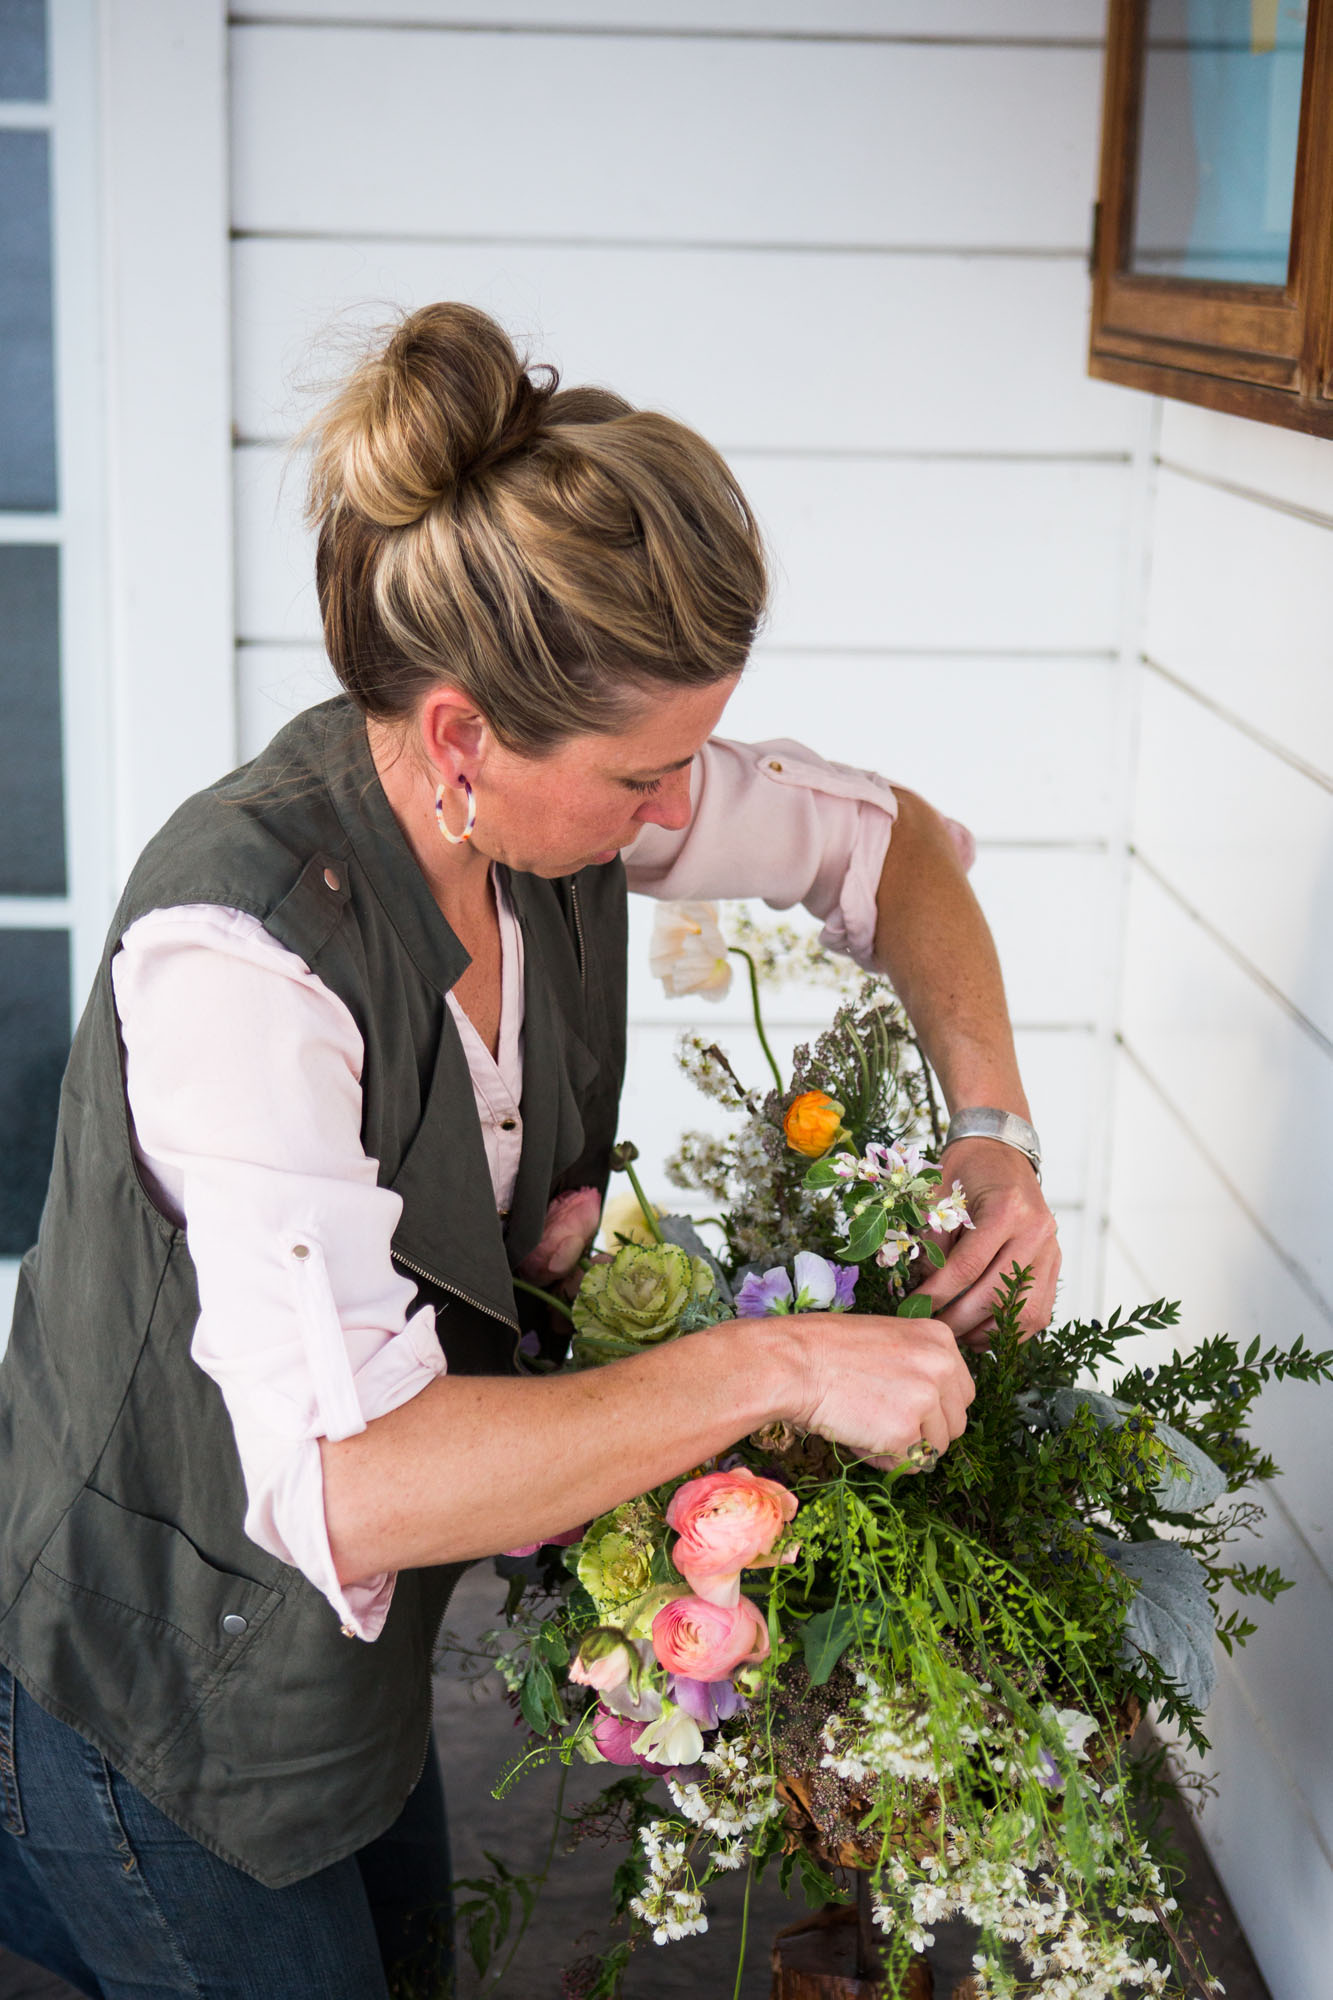 FlowersbyCarra-branding-florist.jpg